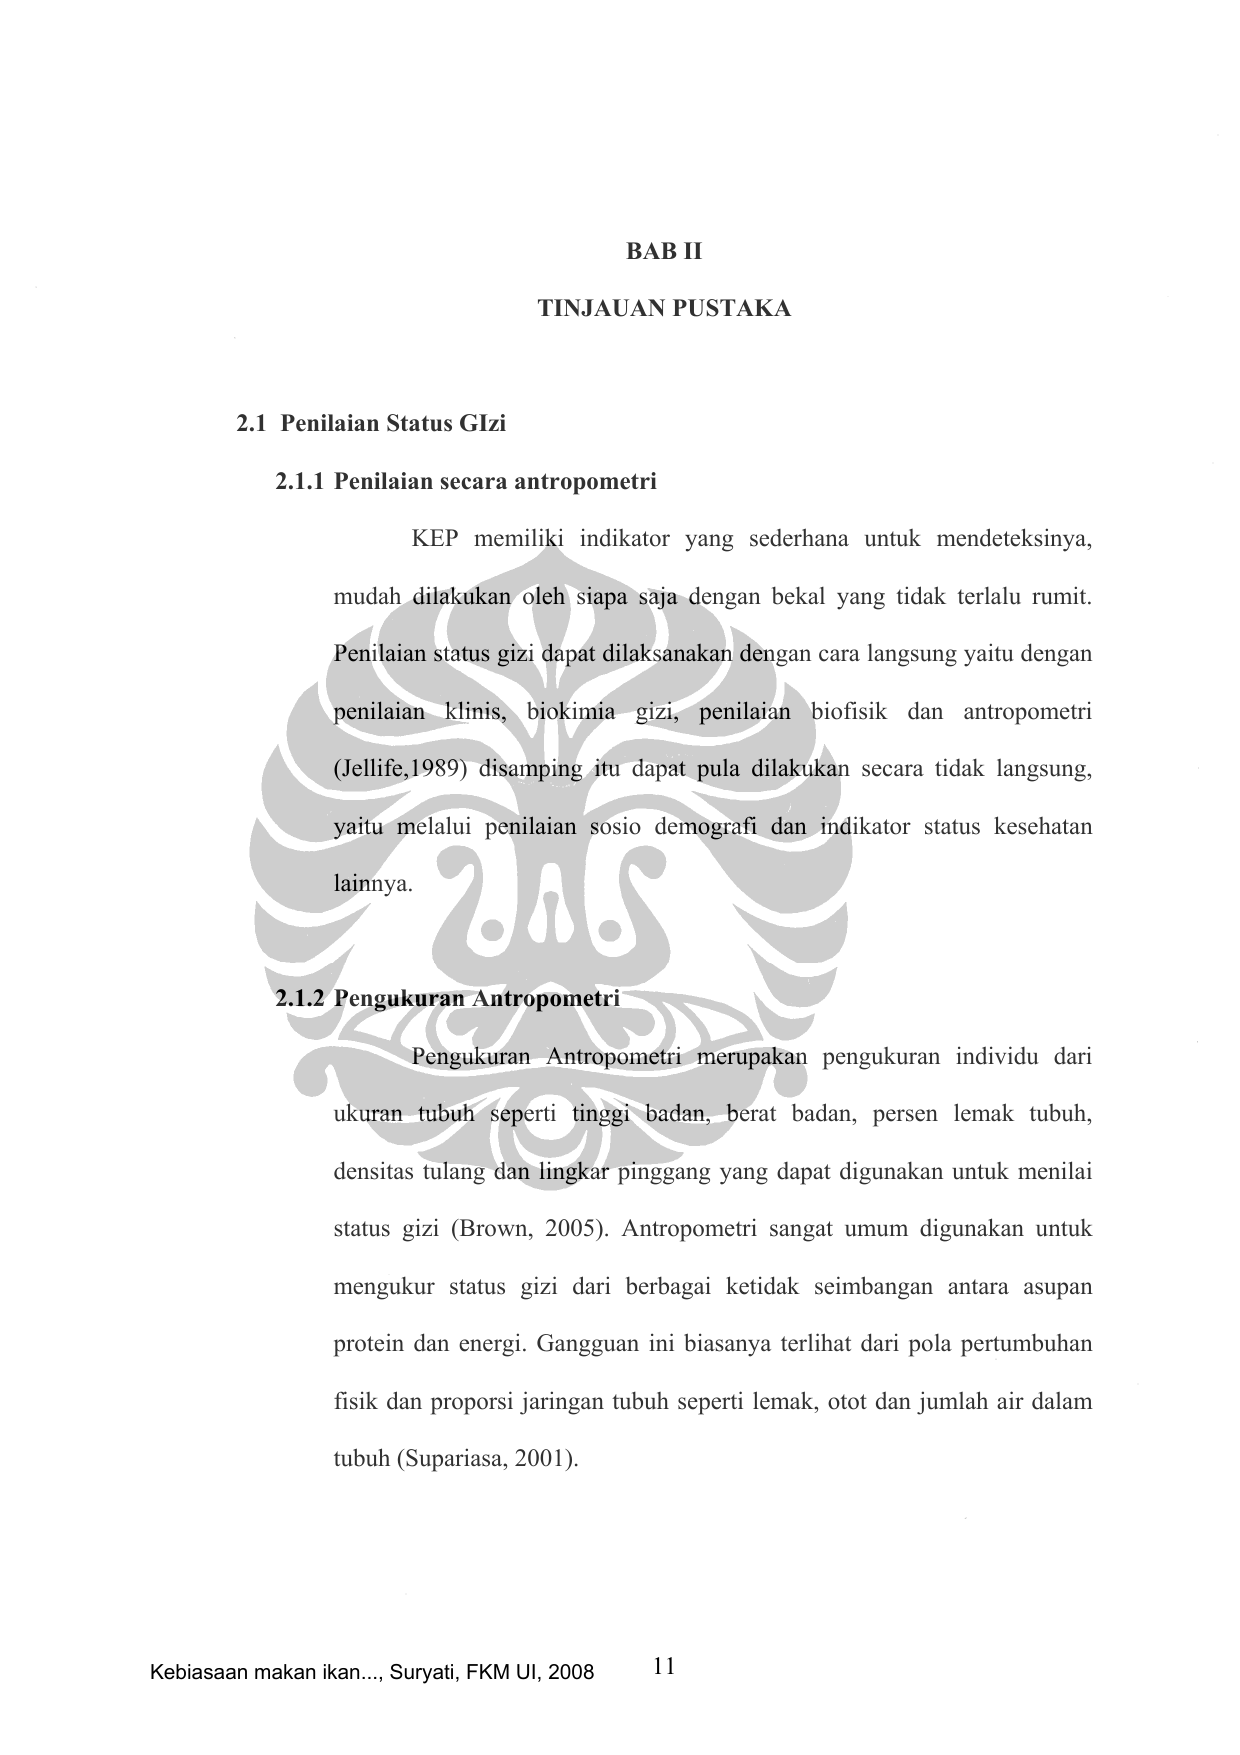 11 bab ii tinjauan pustaka 21 penilaian status gizi 211 ccuart Image collections